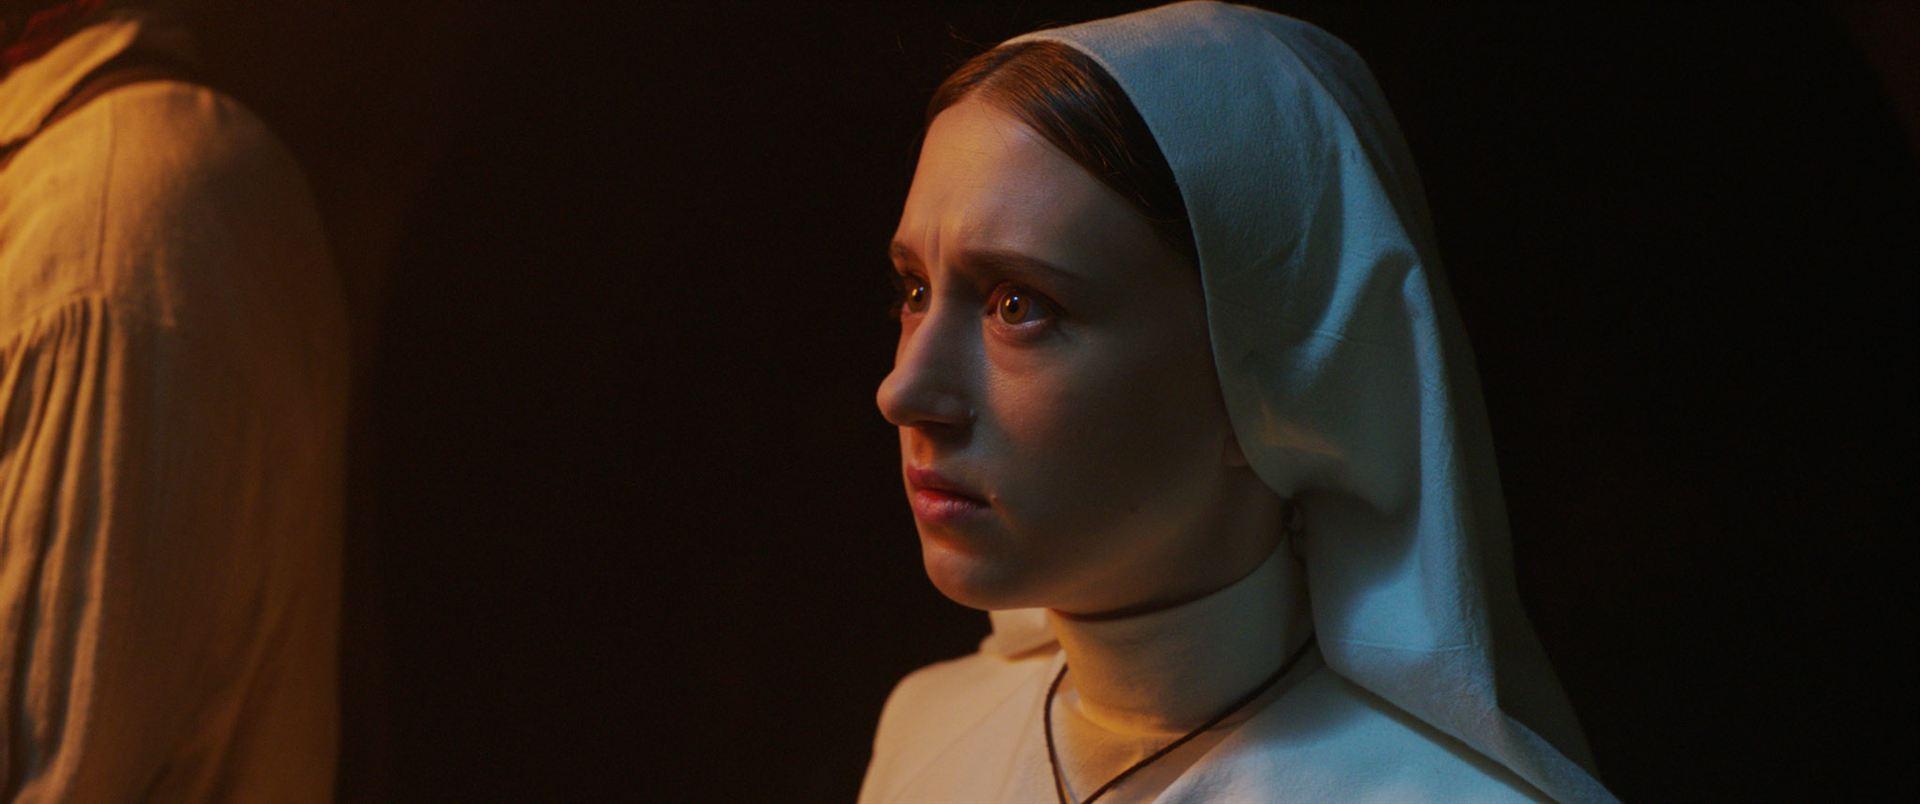 La Nonne (2018)